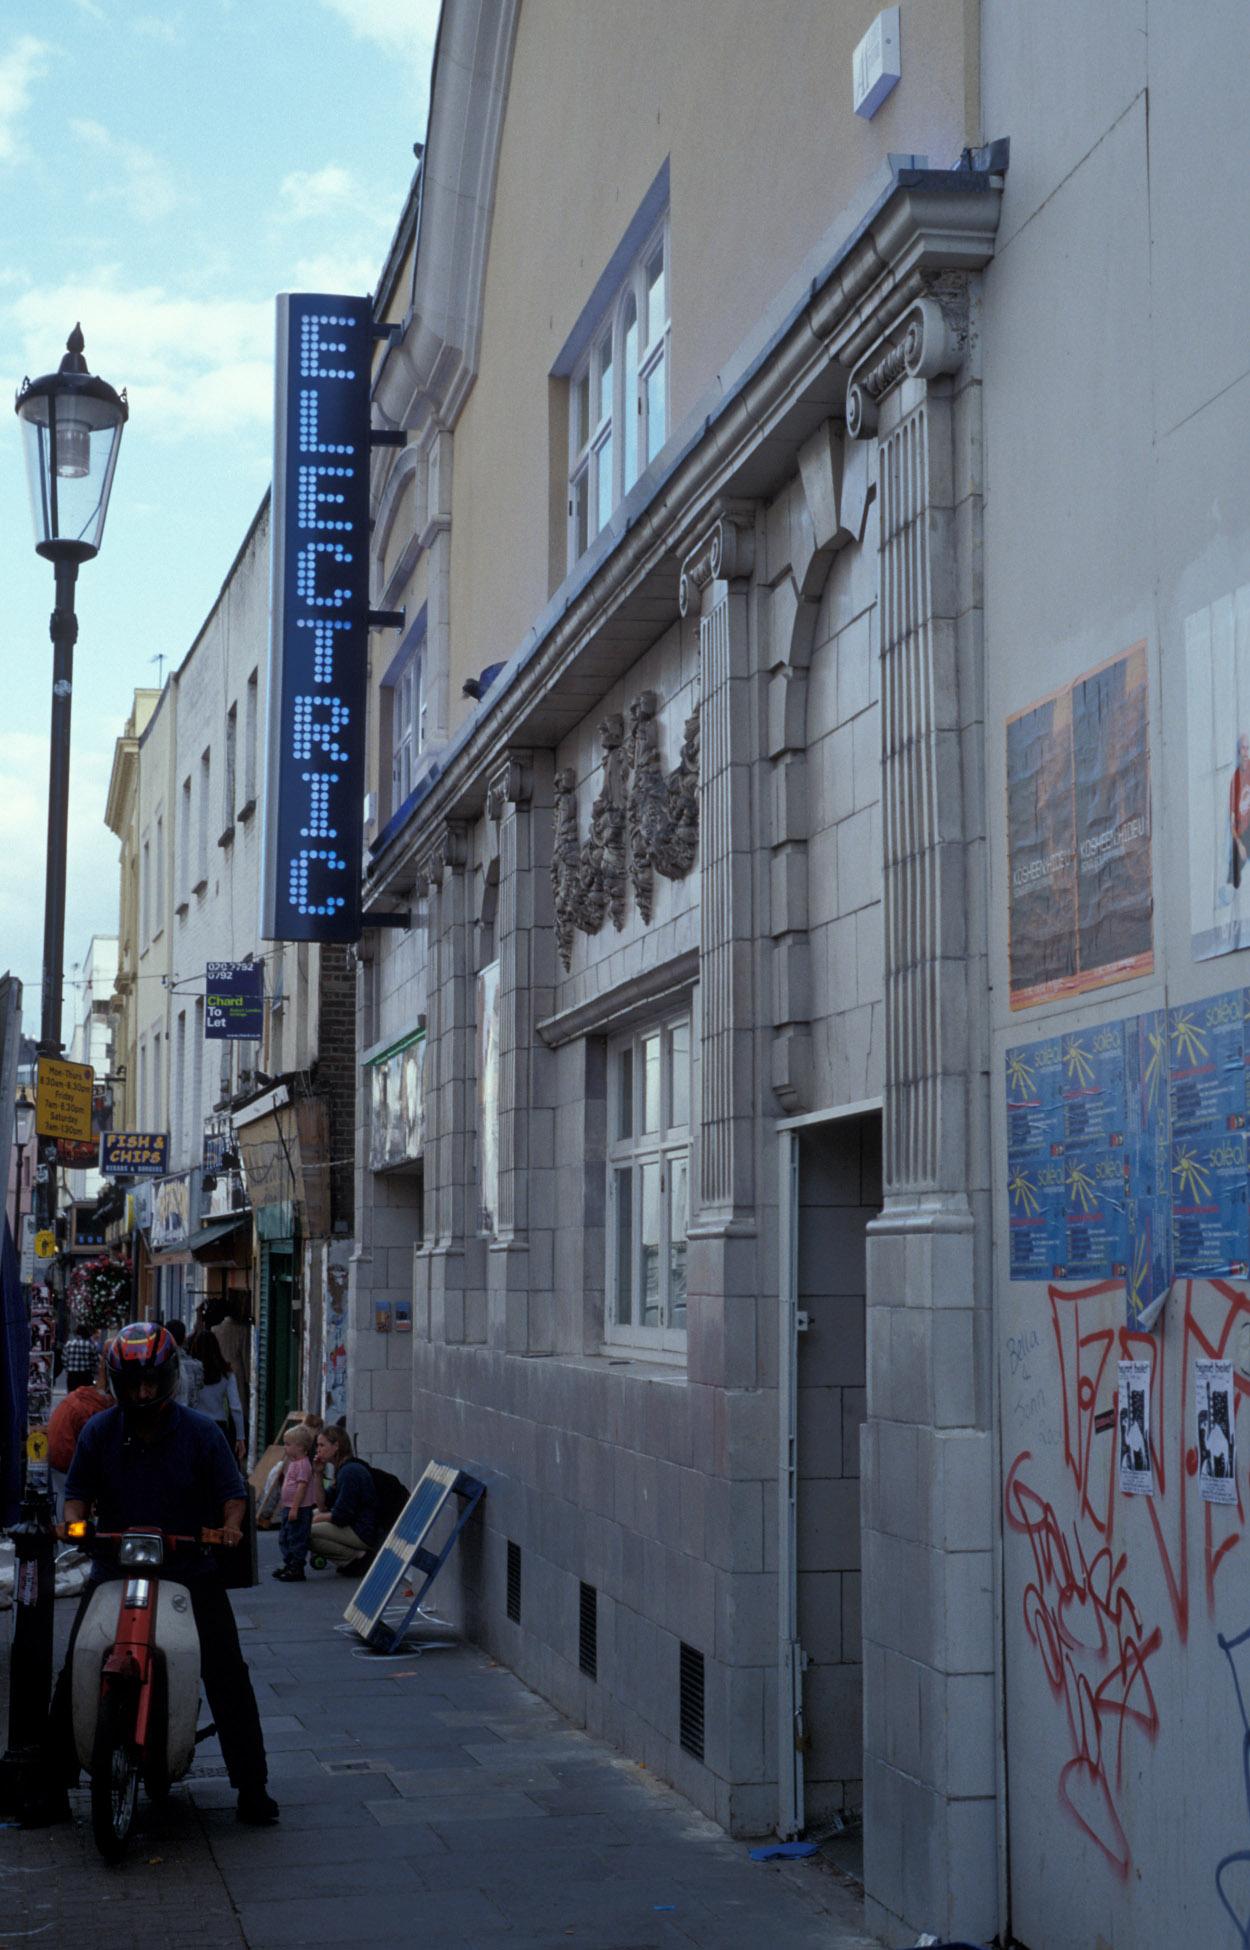 Cinema a londra for Studiare musica a londra